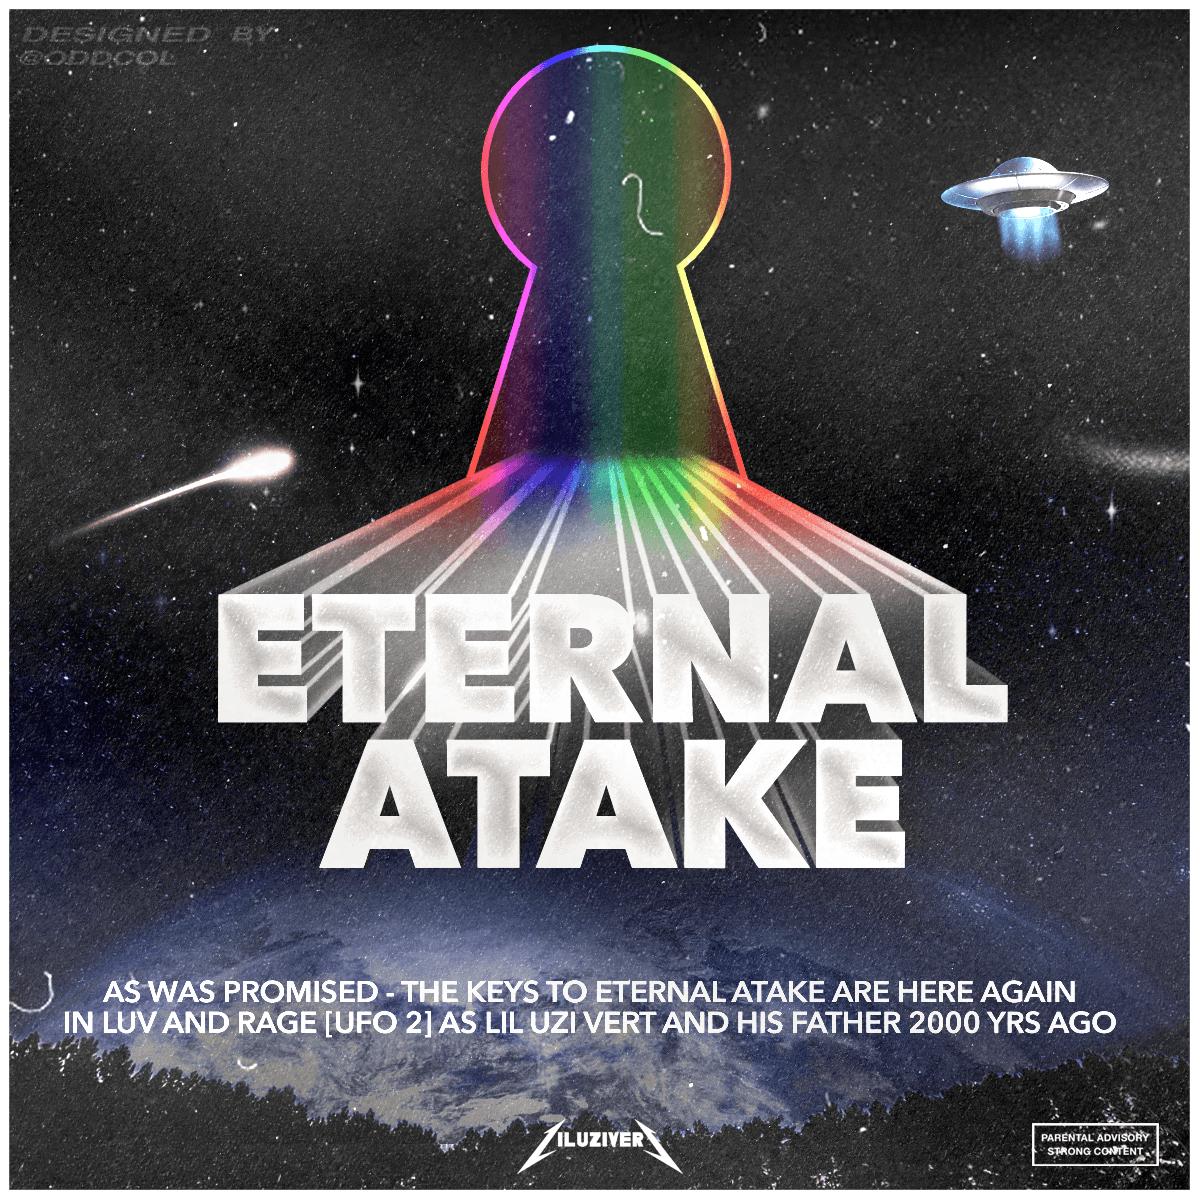 Eternal Atake Deluxe Wallpapers Wallpaper Cave